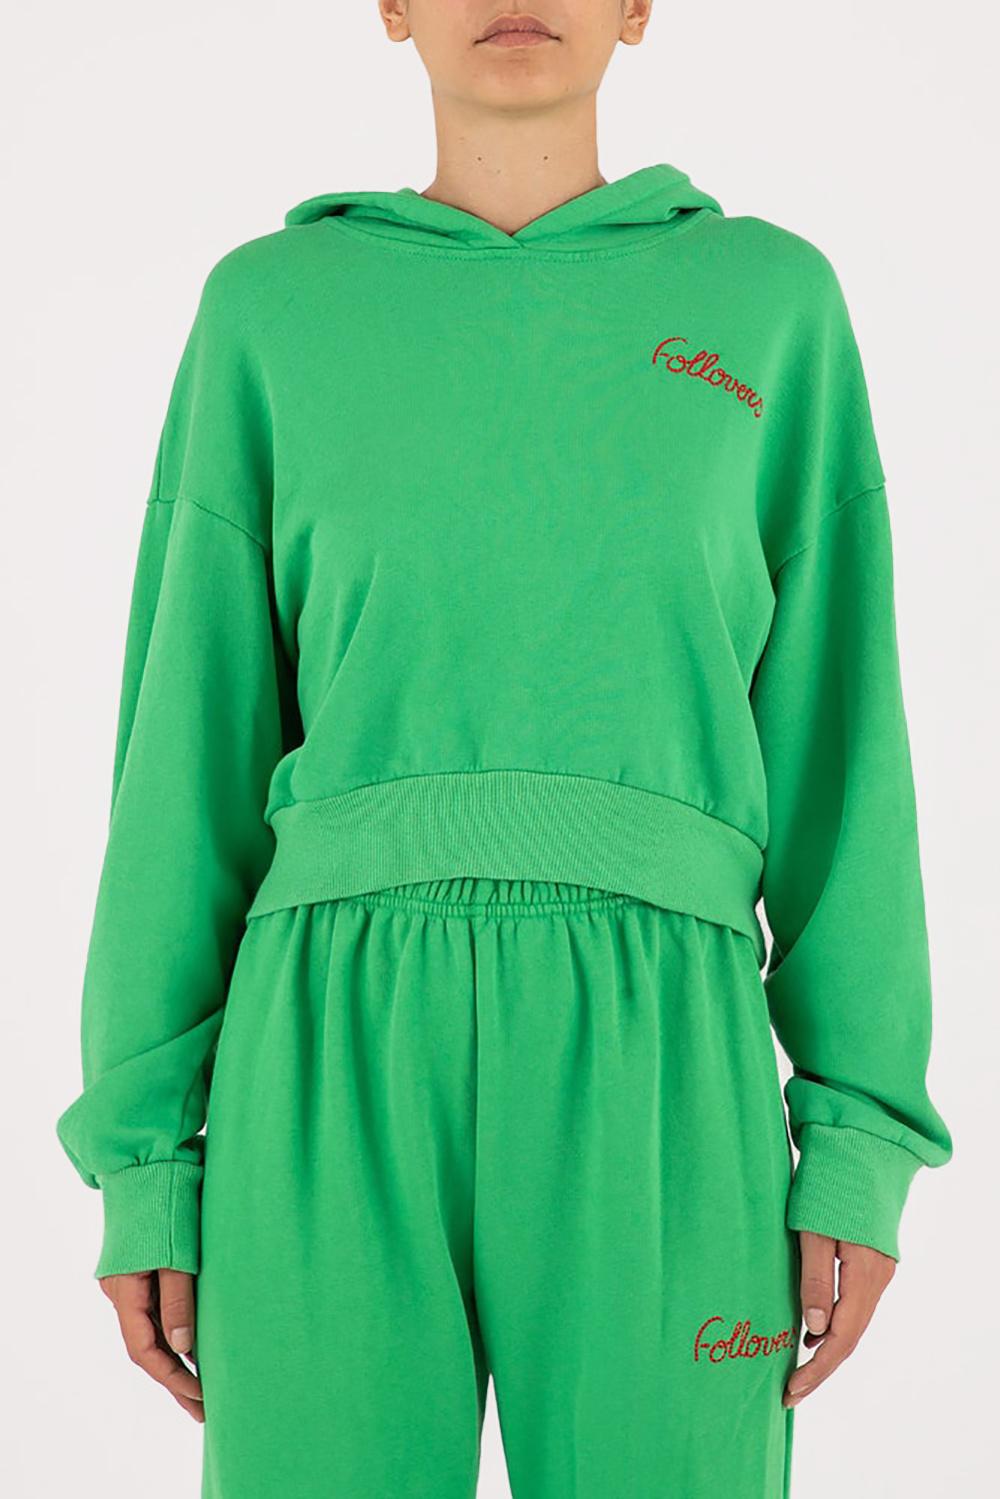 Follovers trui Kylie groen